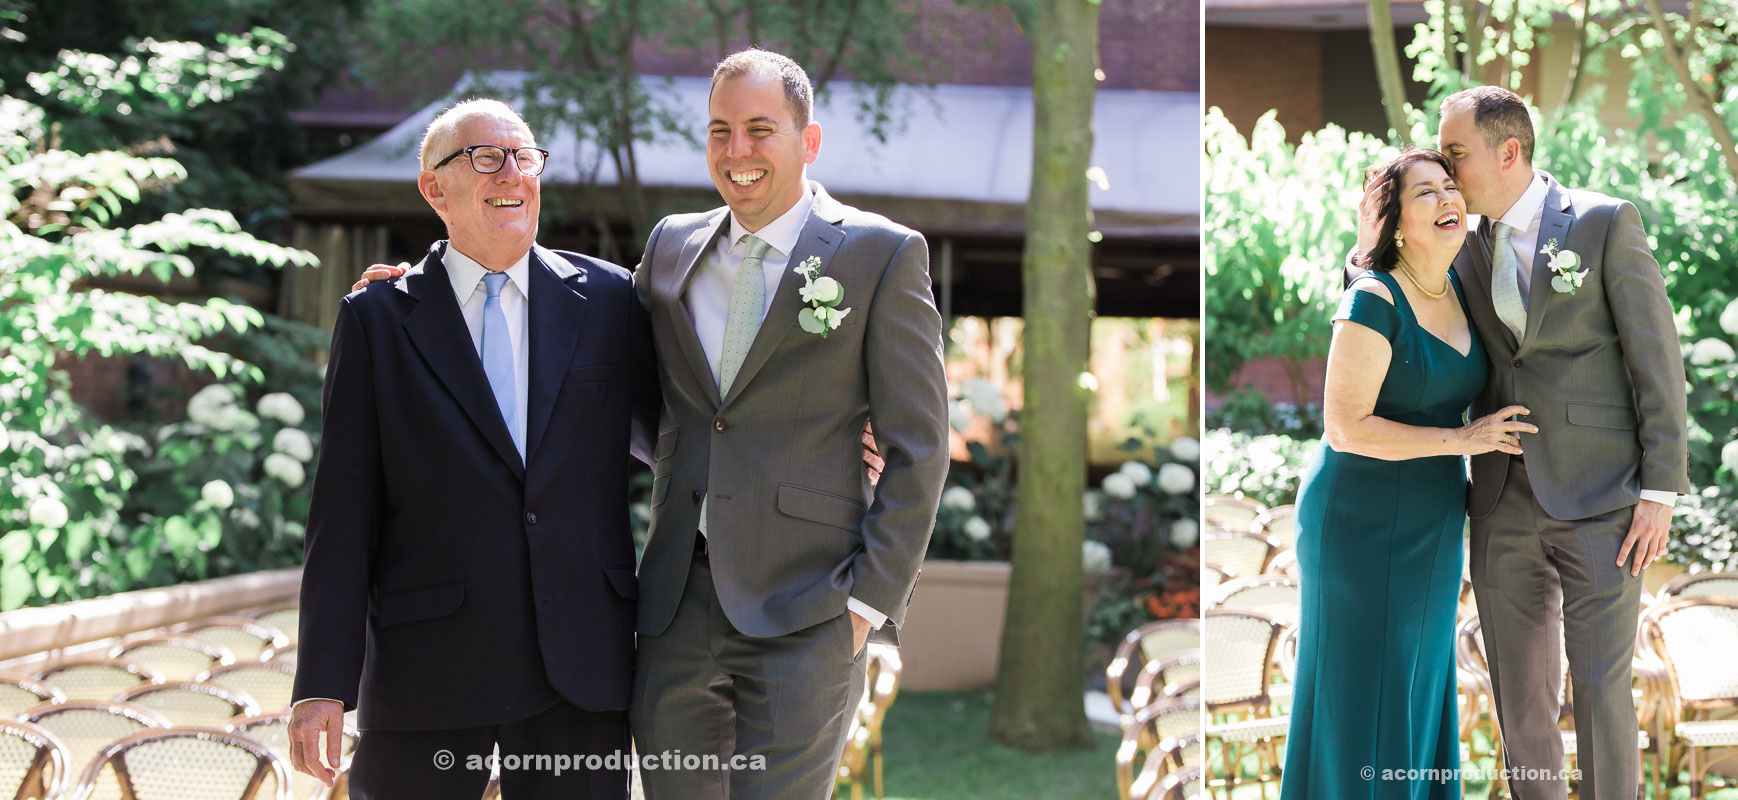 toronto-granite-brewery-wedding-groom-and-his-parents-by-acornproduction.ca-04.jpg